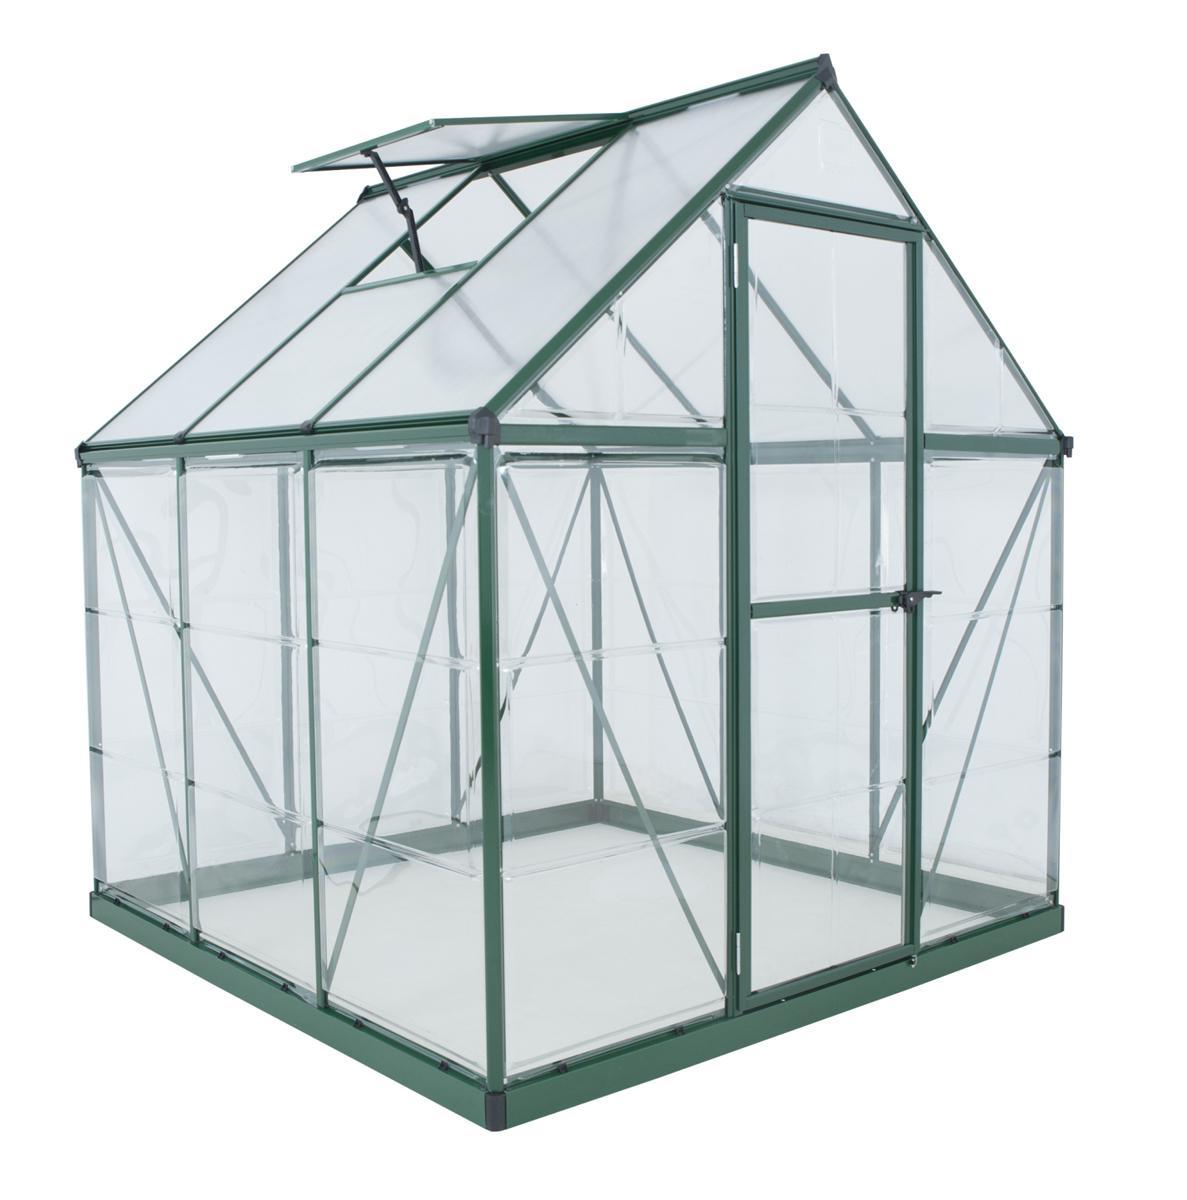 Hybrid 6' x 6' Greenhouse - Green